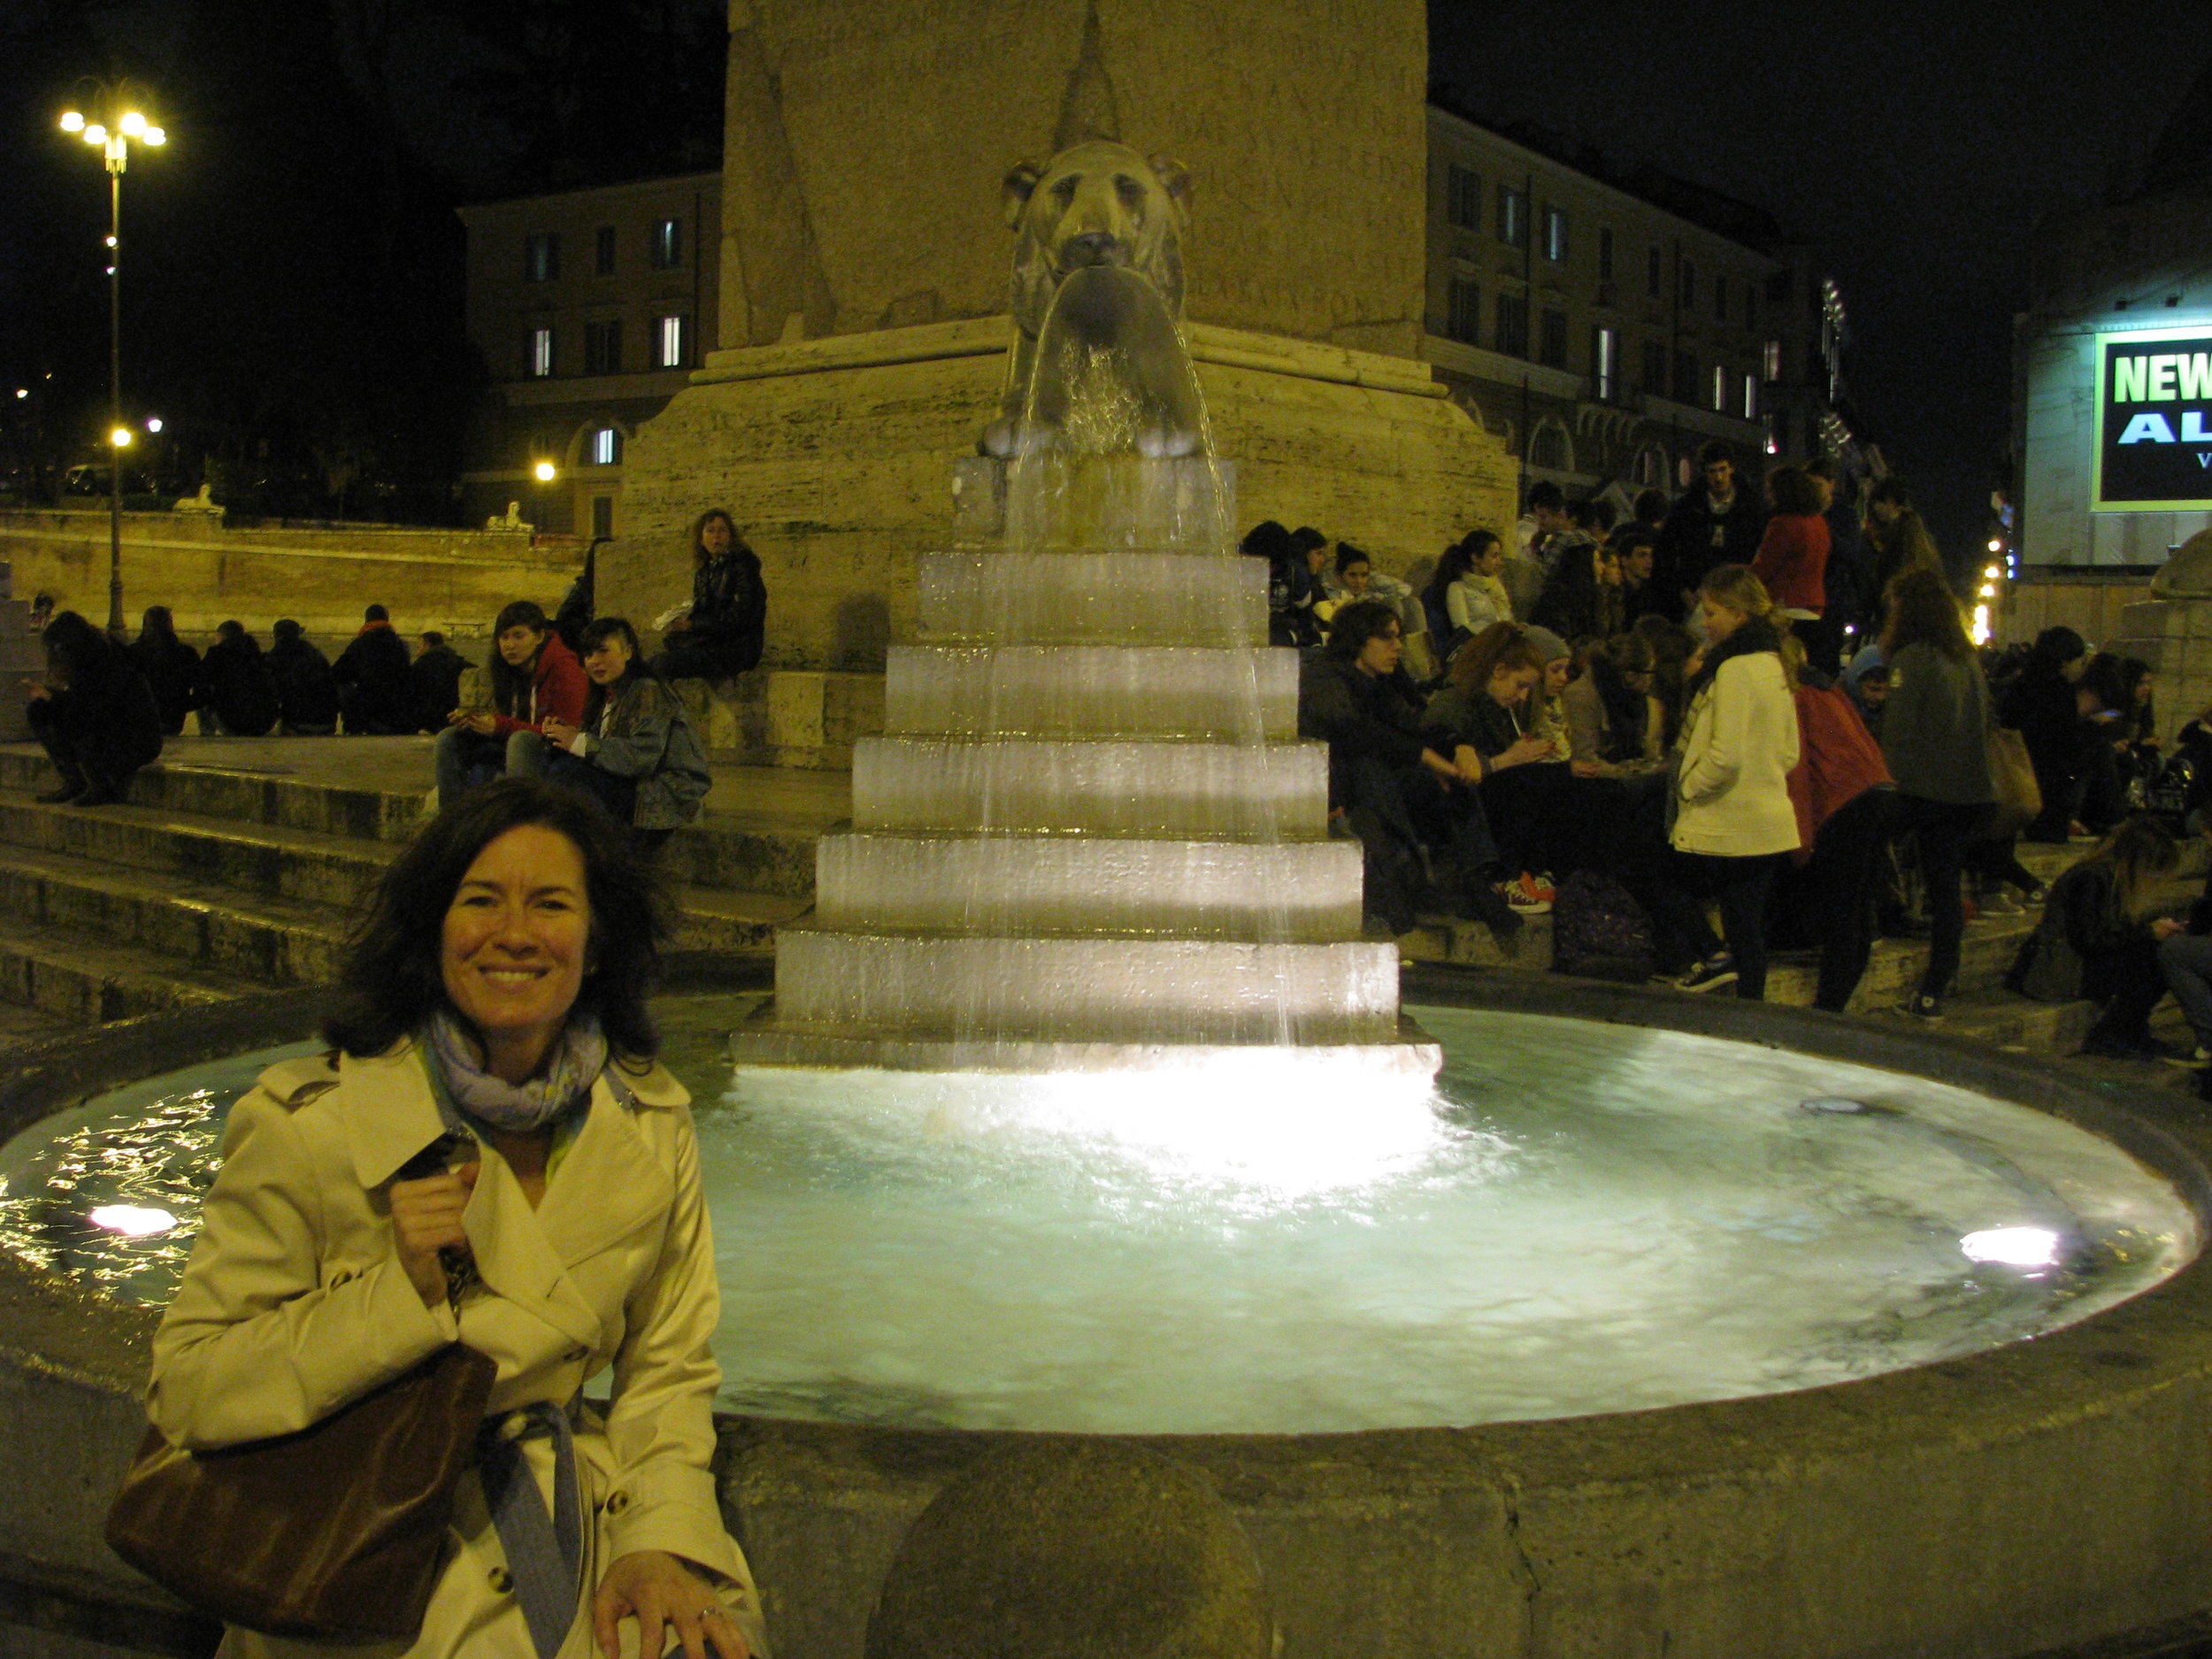 Laura at Piazza del Popolo foutain